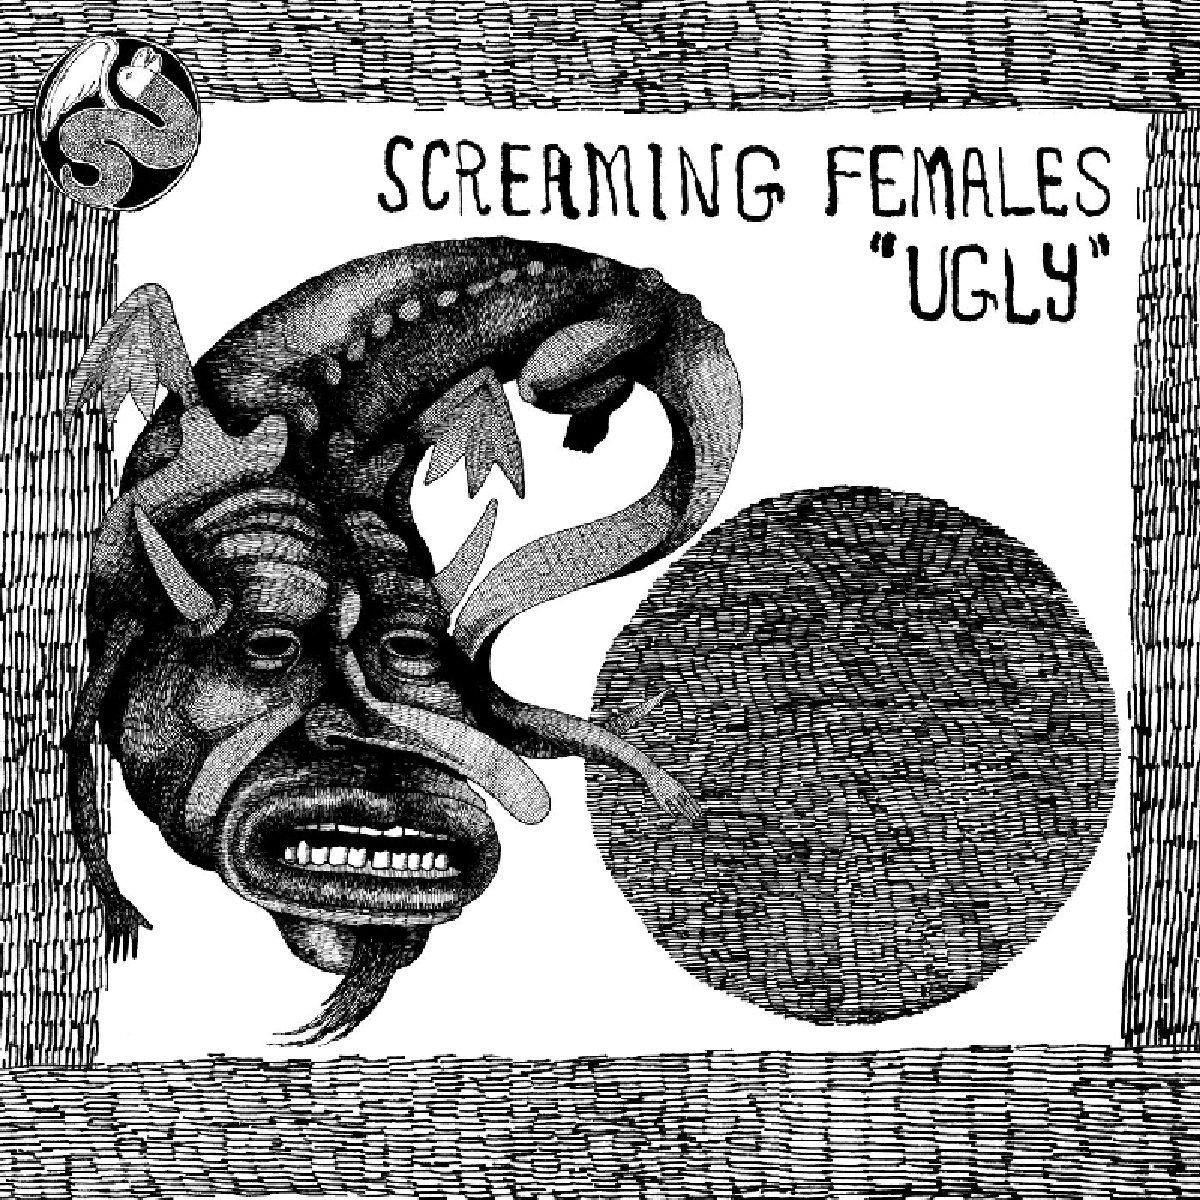 screaming females ugly amazon music Double Live Album